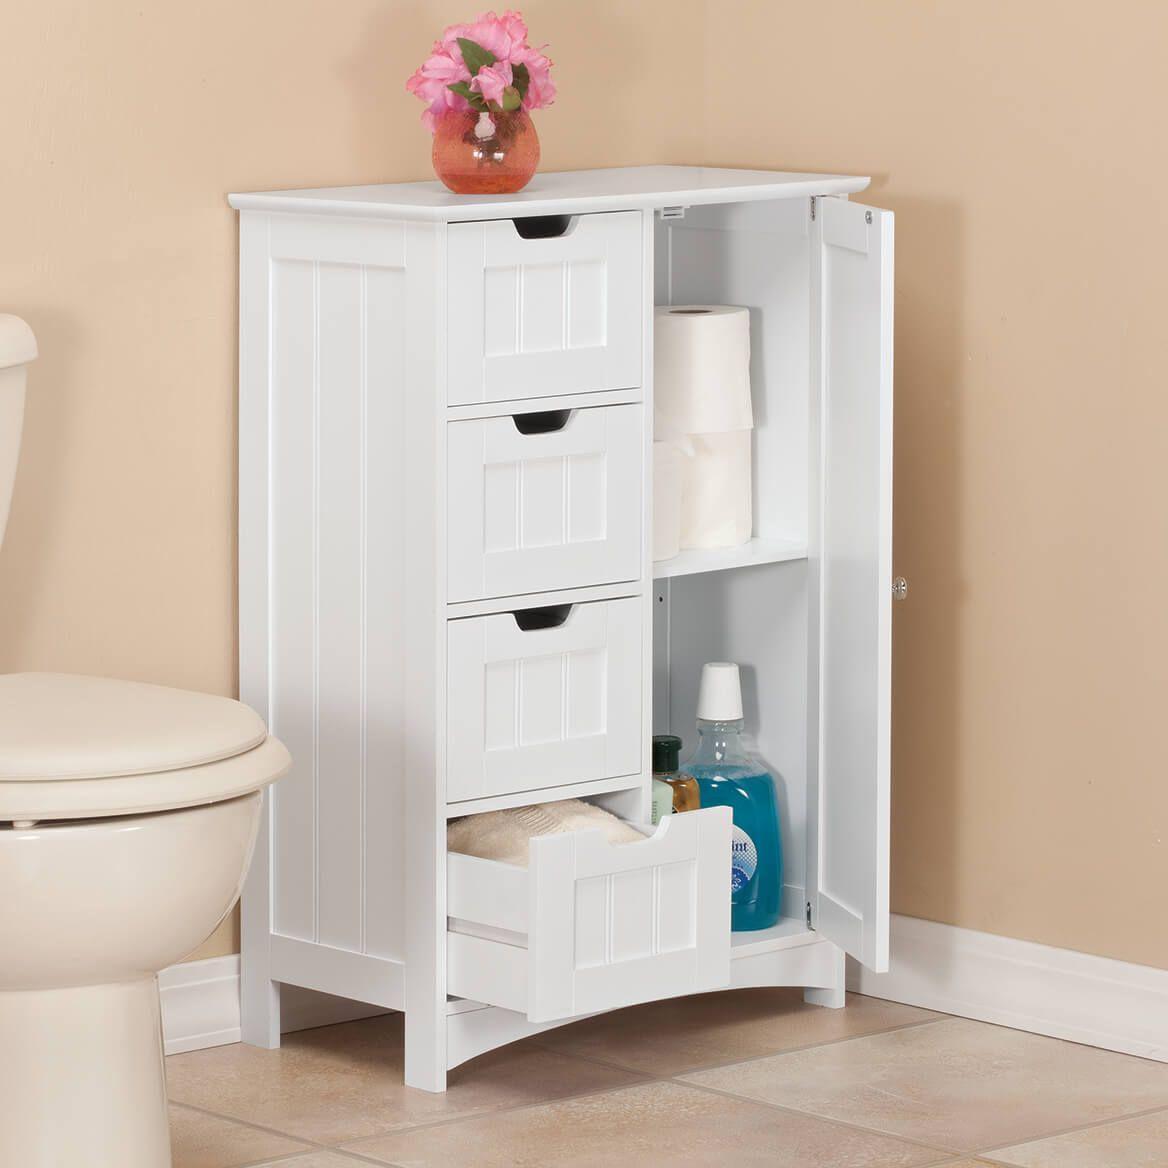 Ambrose Collection Bathroom Cabinet by OakRidge™     XL-361901